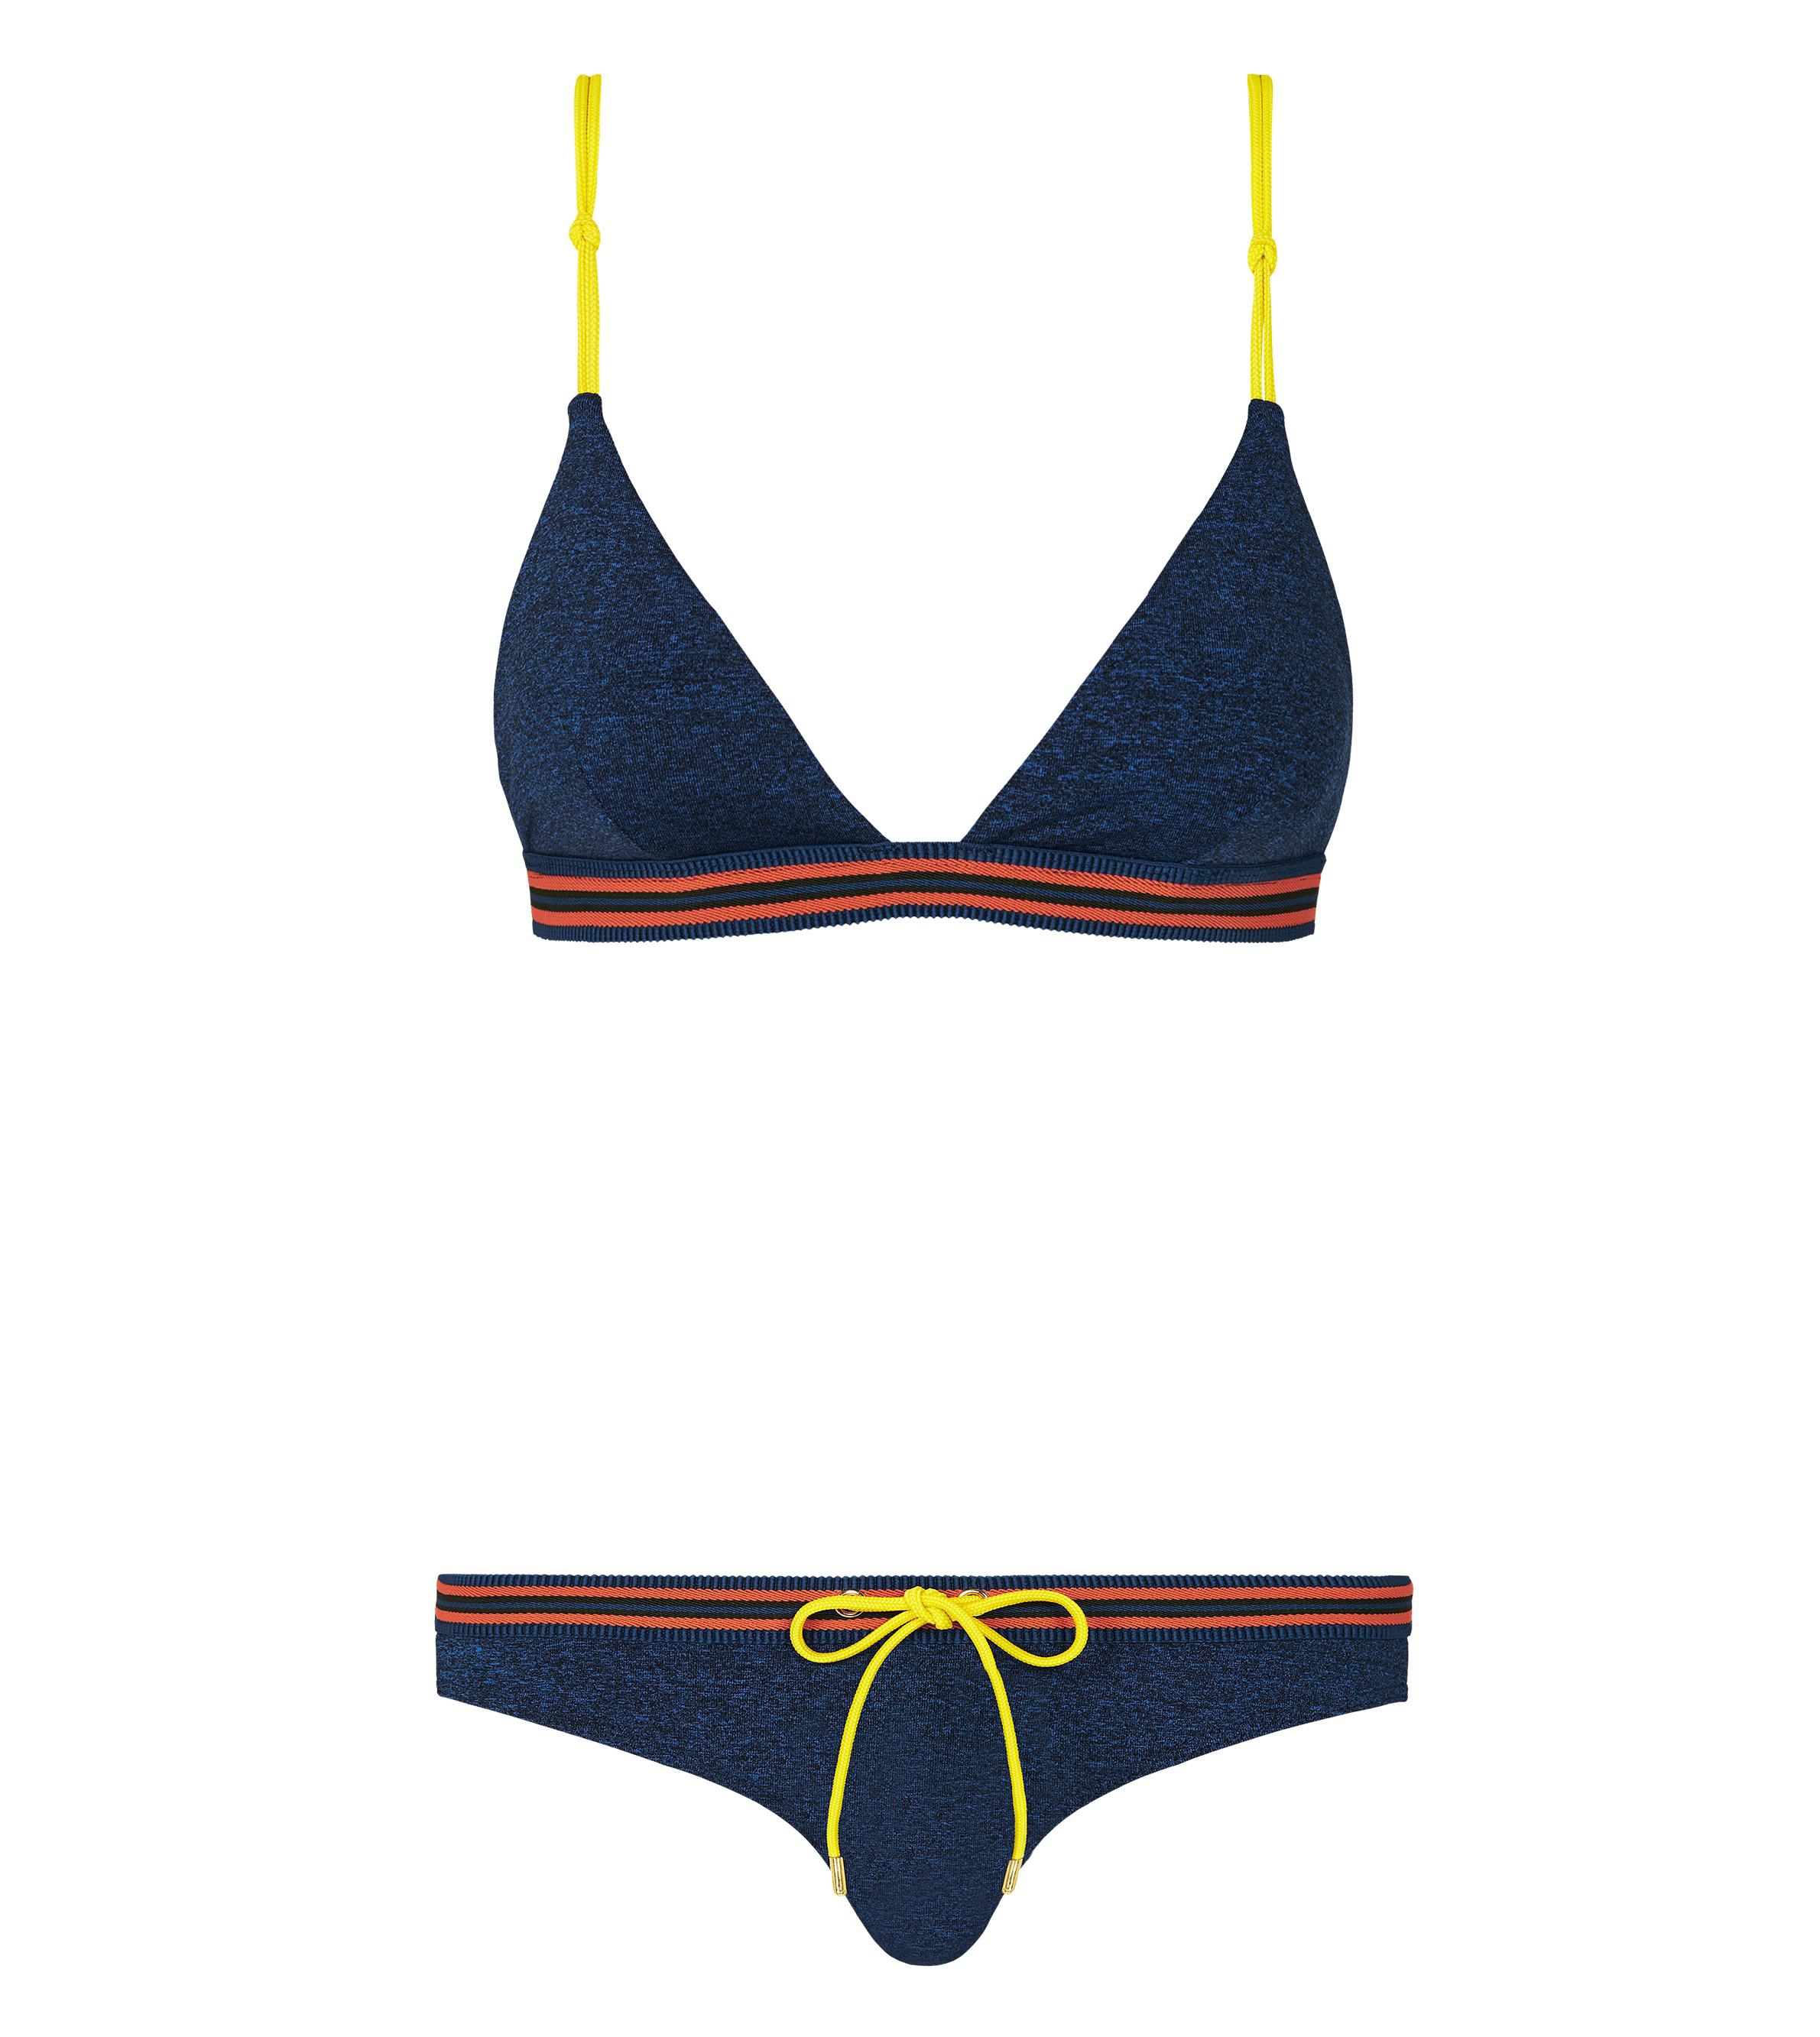 Bikini clipart transparent. Png images free download